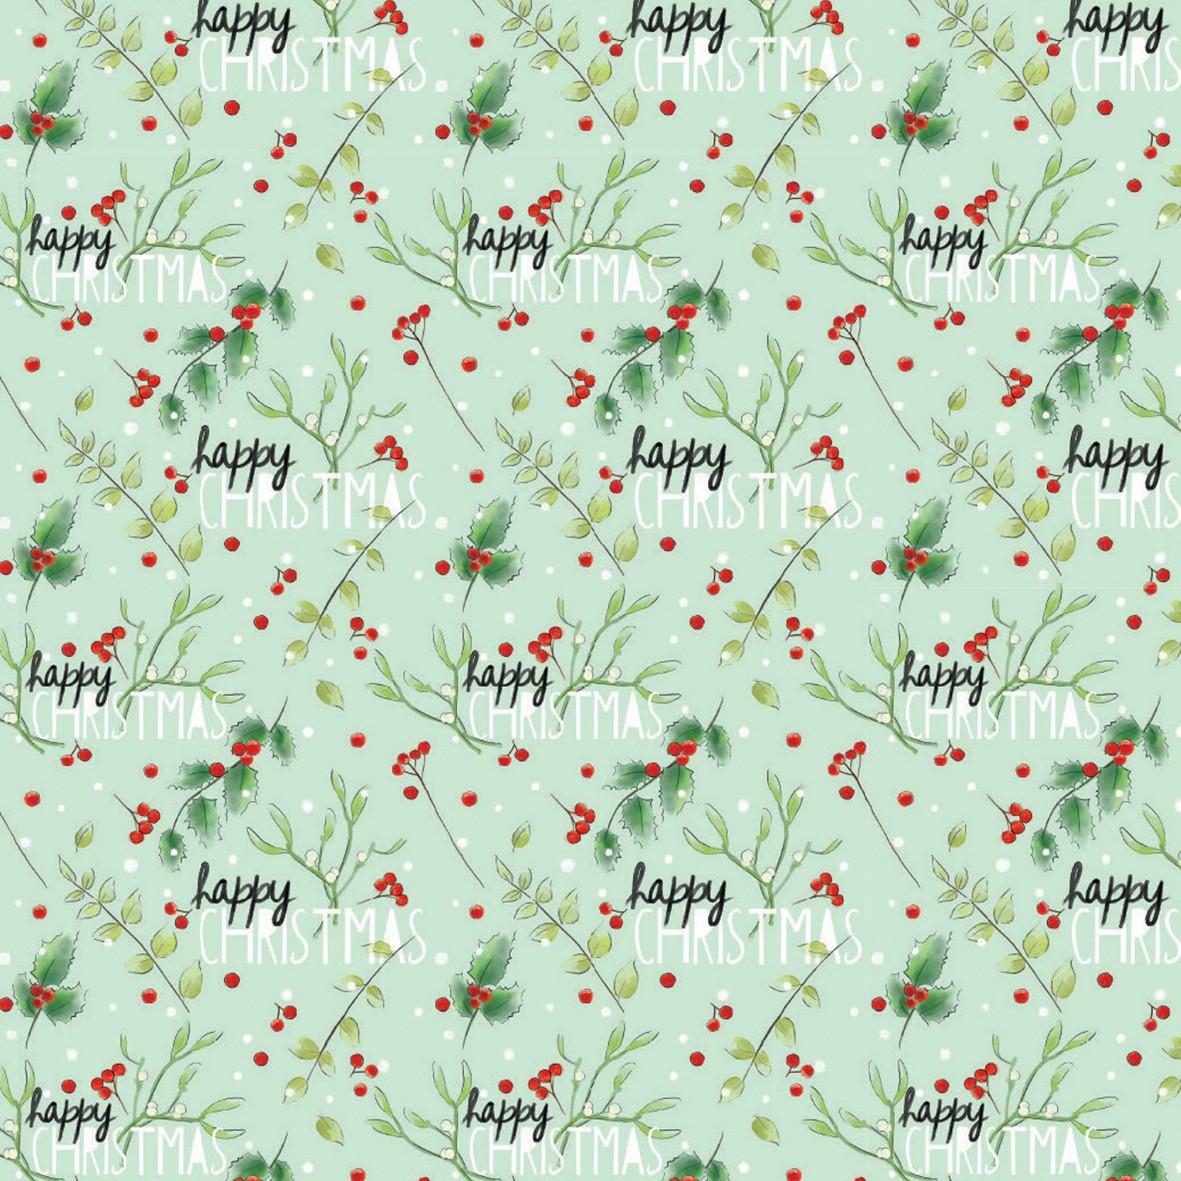 Christmas Gift Wrap Design.Mistletoe Gift Wrap